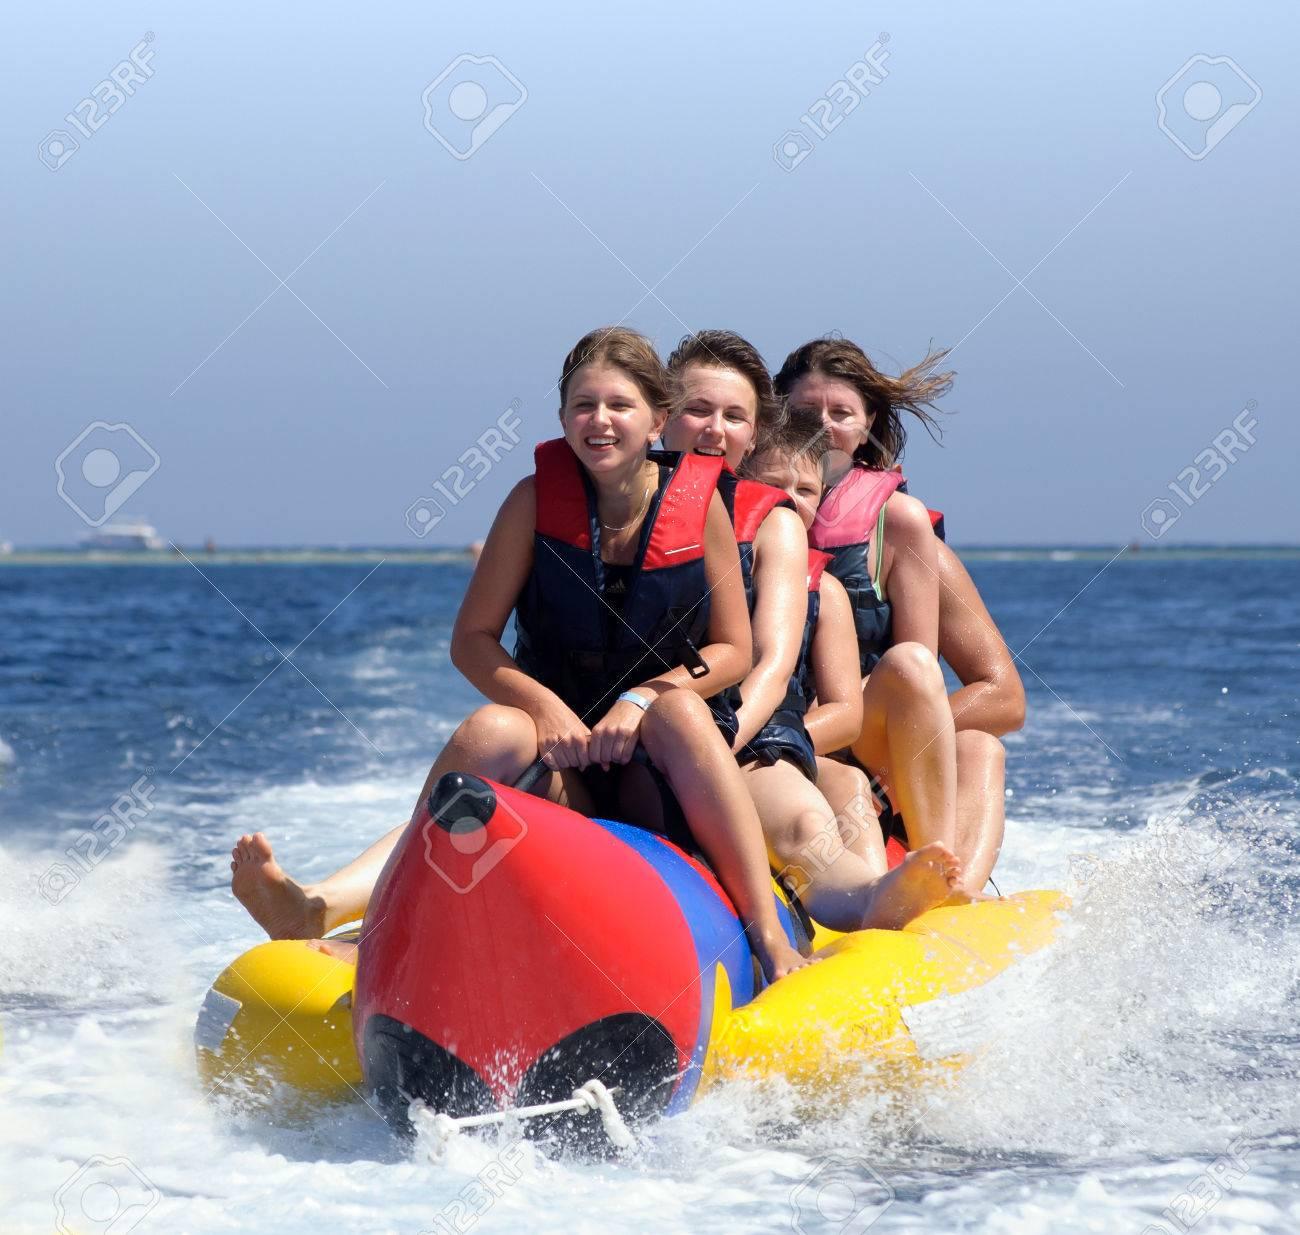 happy people having fun on banana boat on the red sea - 66701524